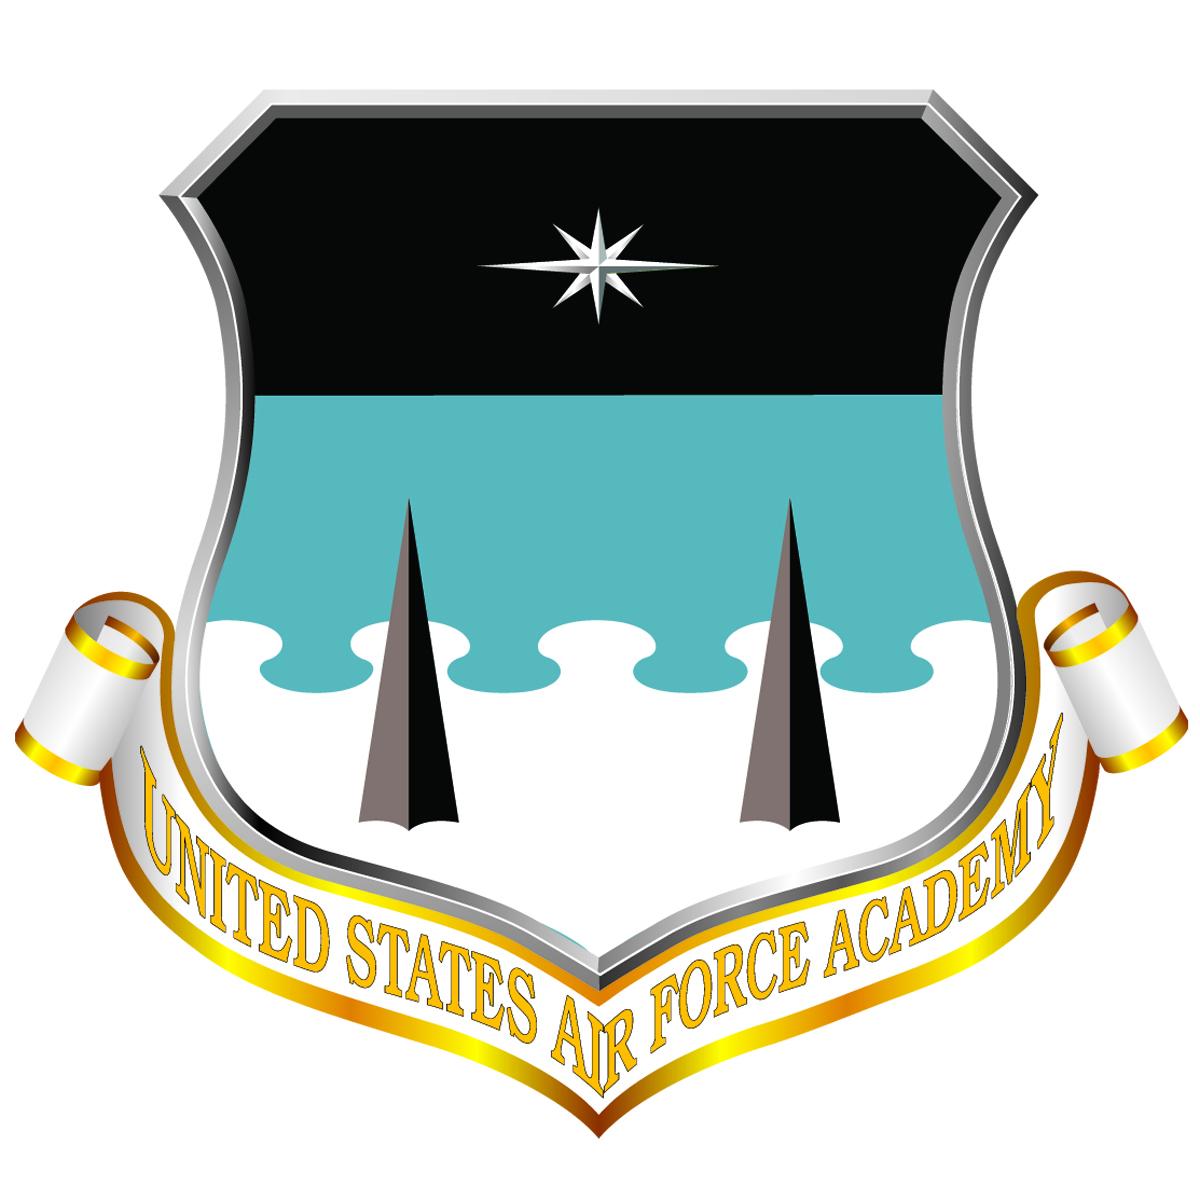 Index of /uah/Logos/University.